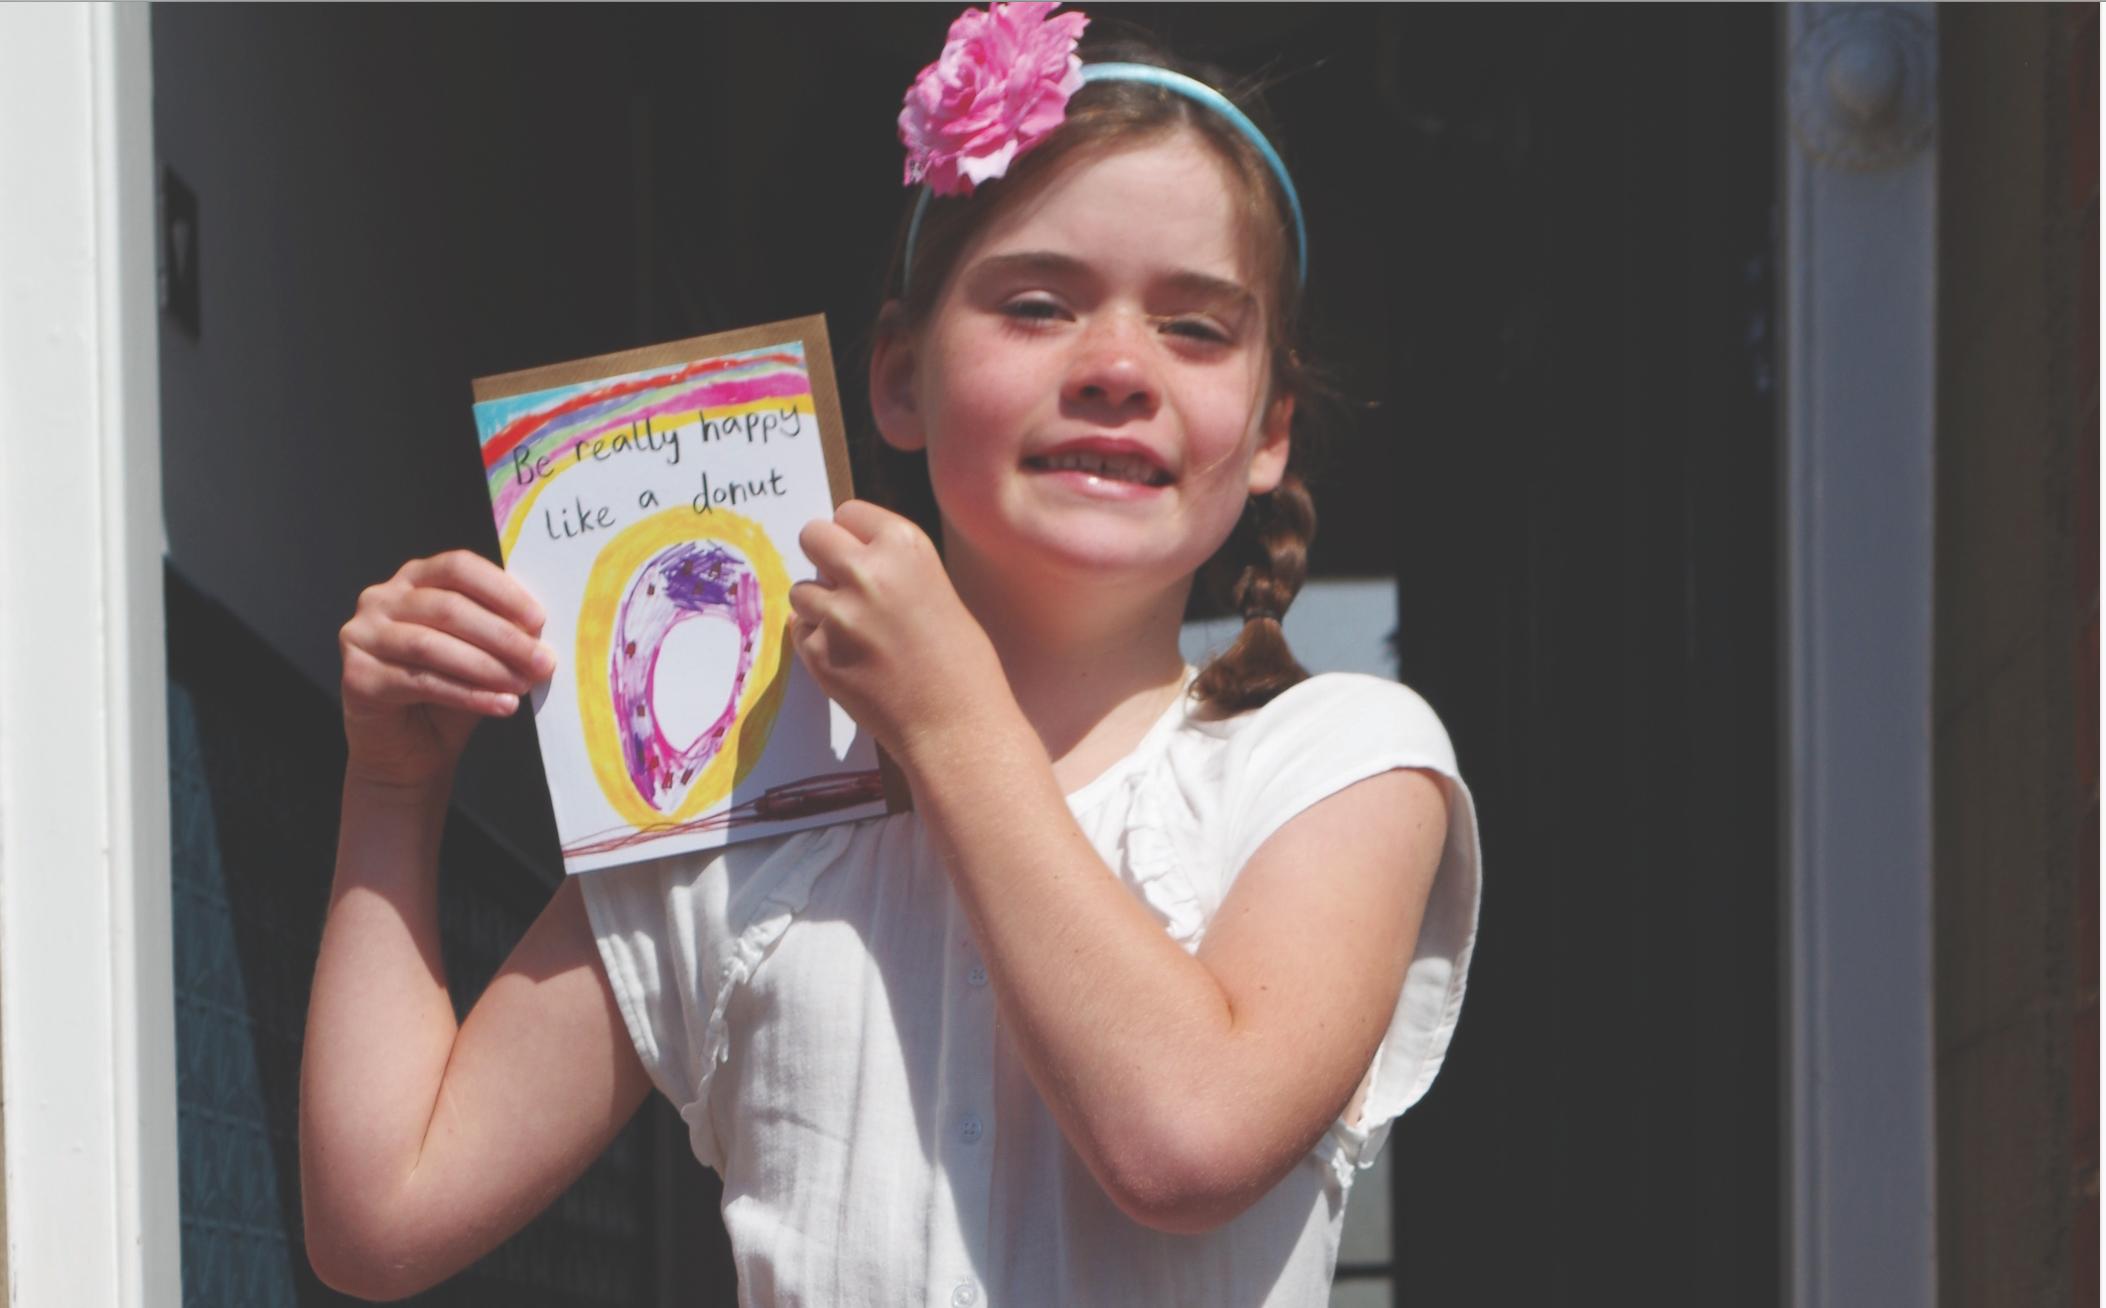 Above: Six-year old Vivi Caplin with her happy doughnut design.